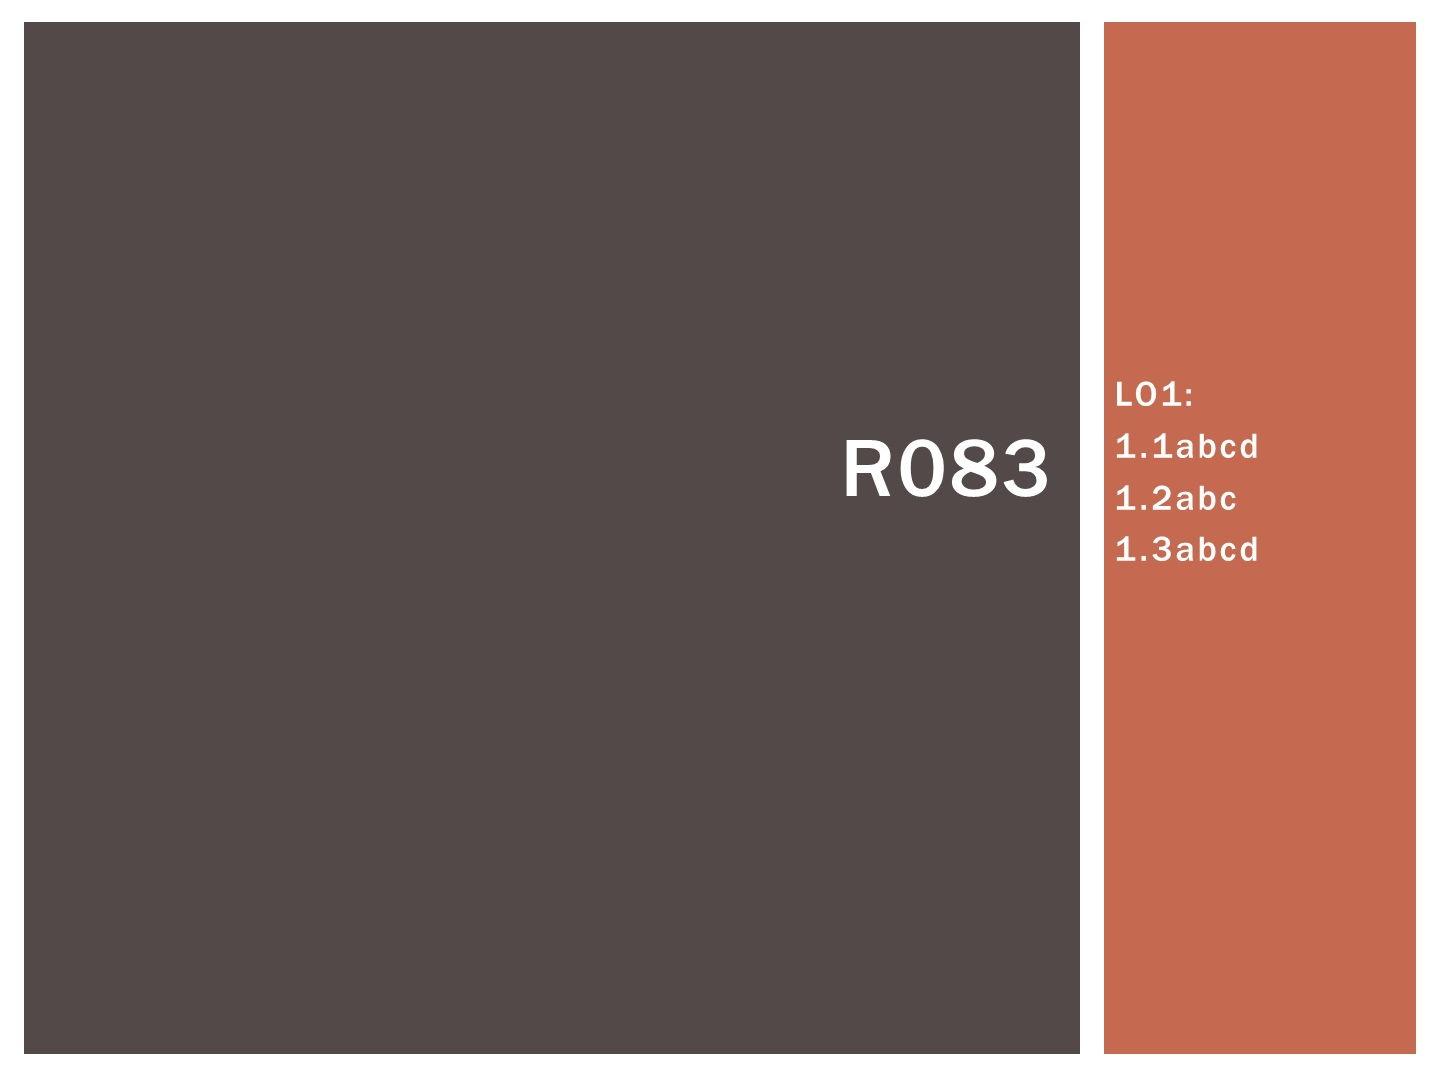 R083 - Creating Digital Characters, [LO1], CAMNATS, Creative iMedia Lvls 1/2